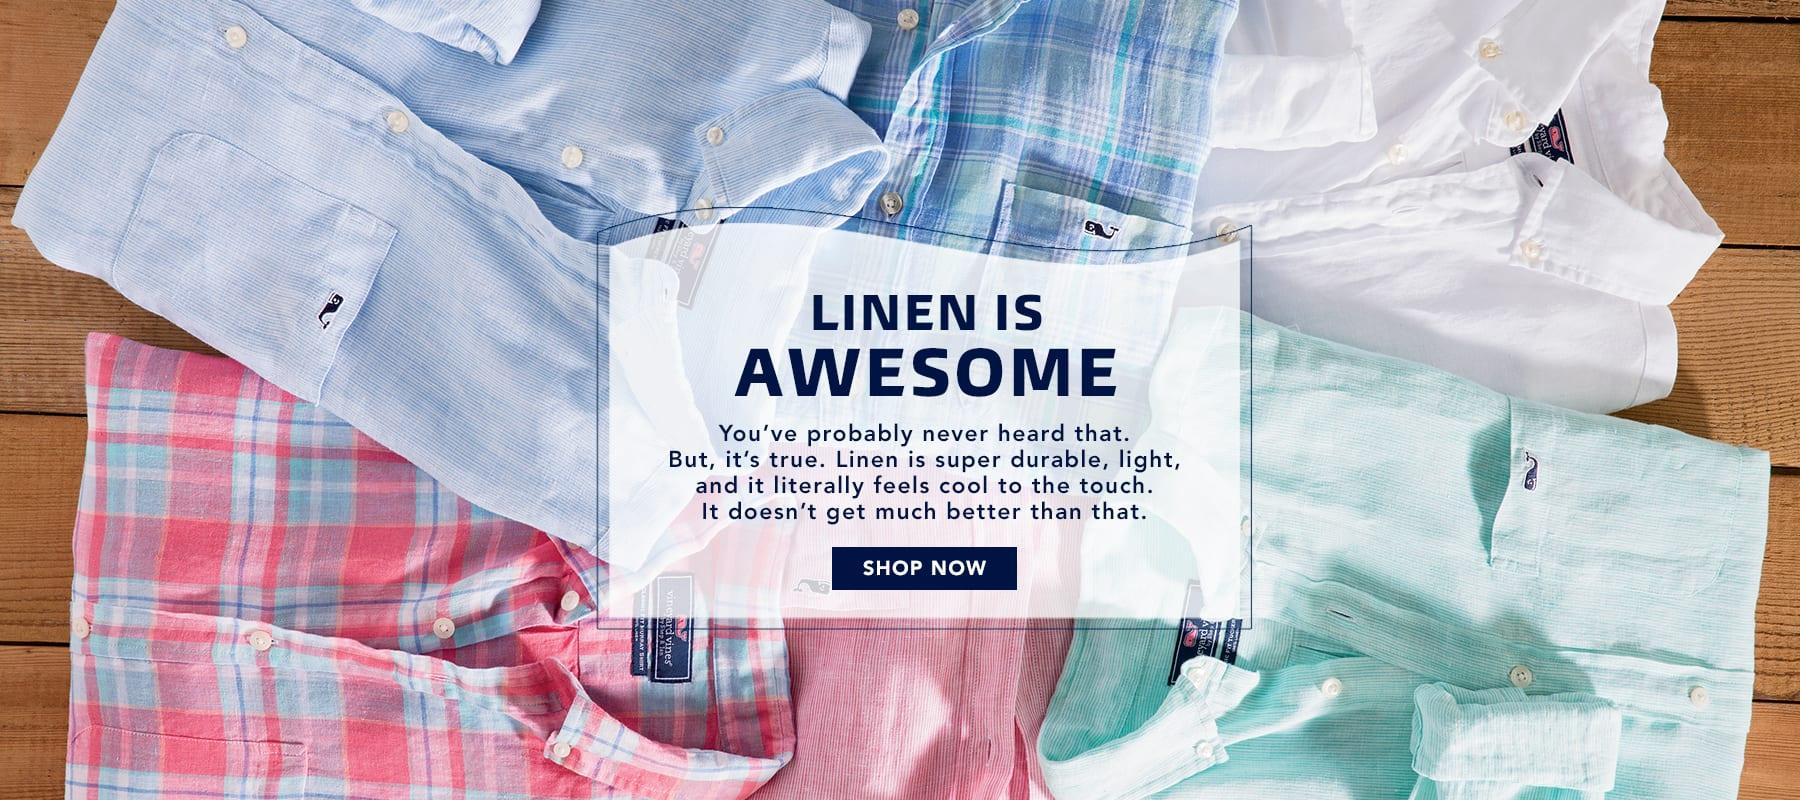 Linen is awesome. Shop Men's Linen Shirts.